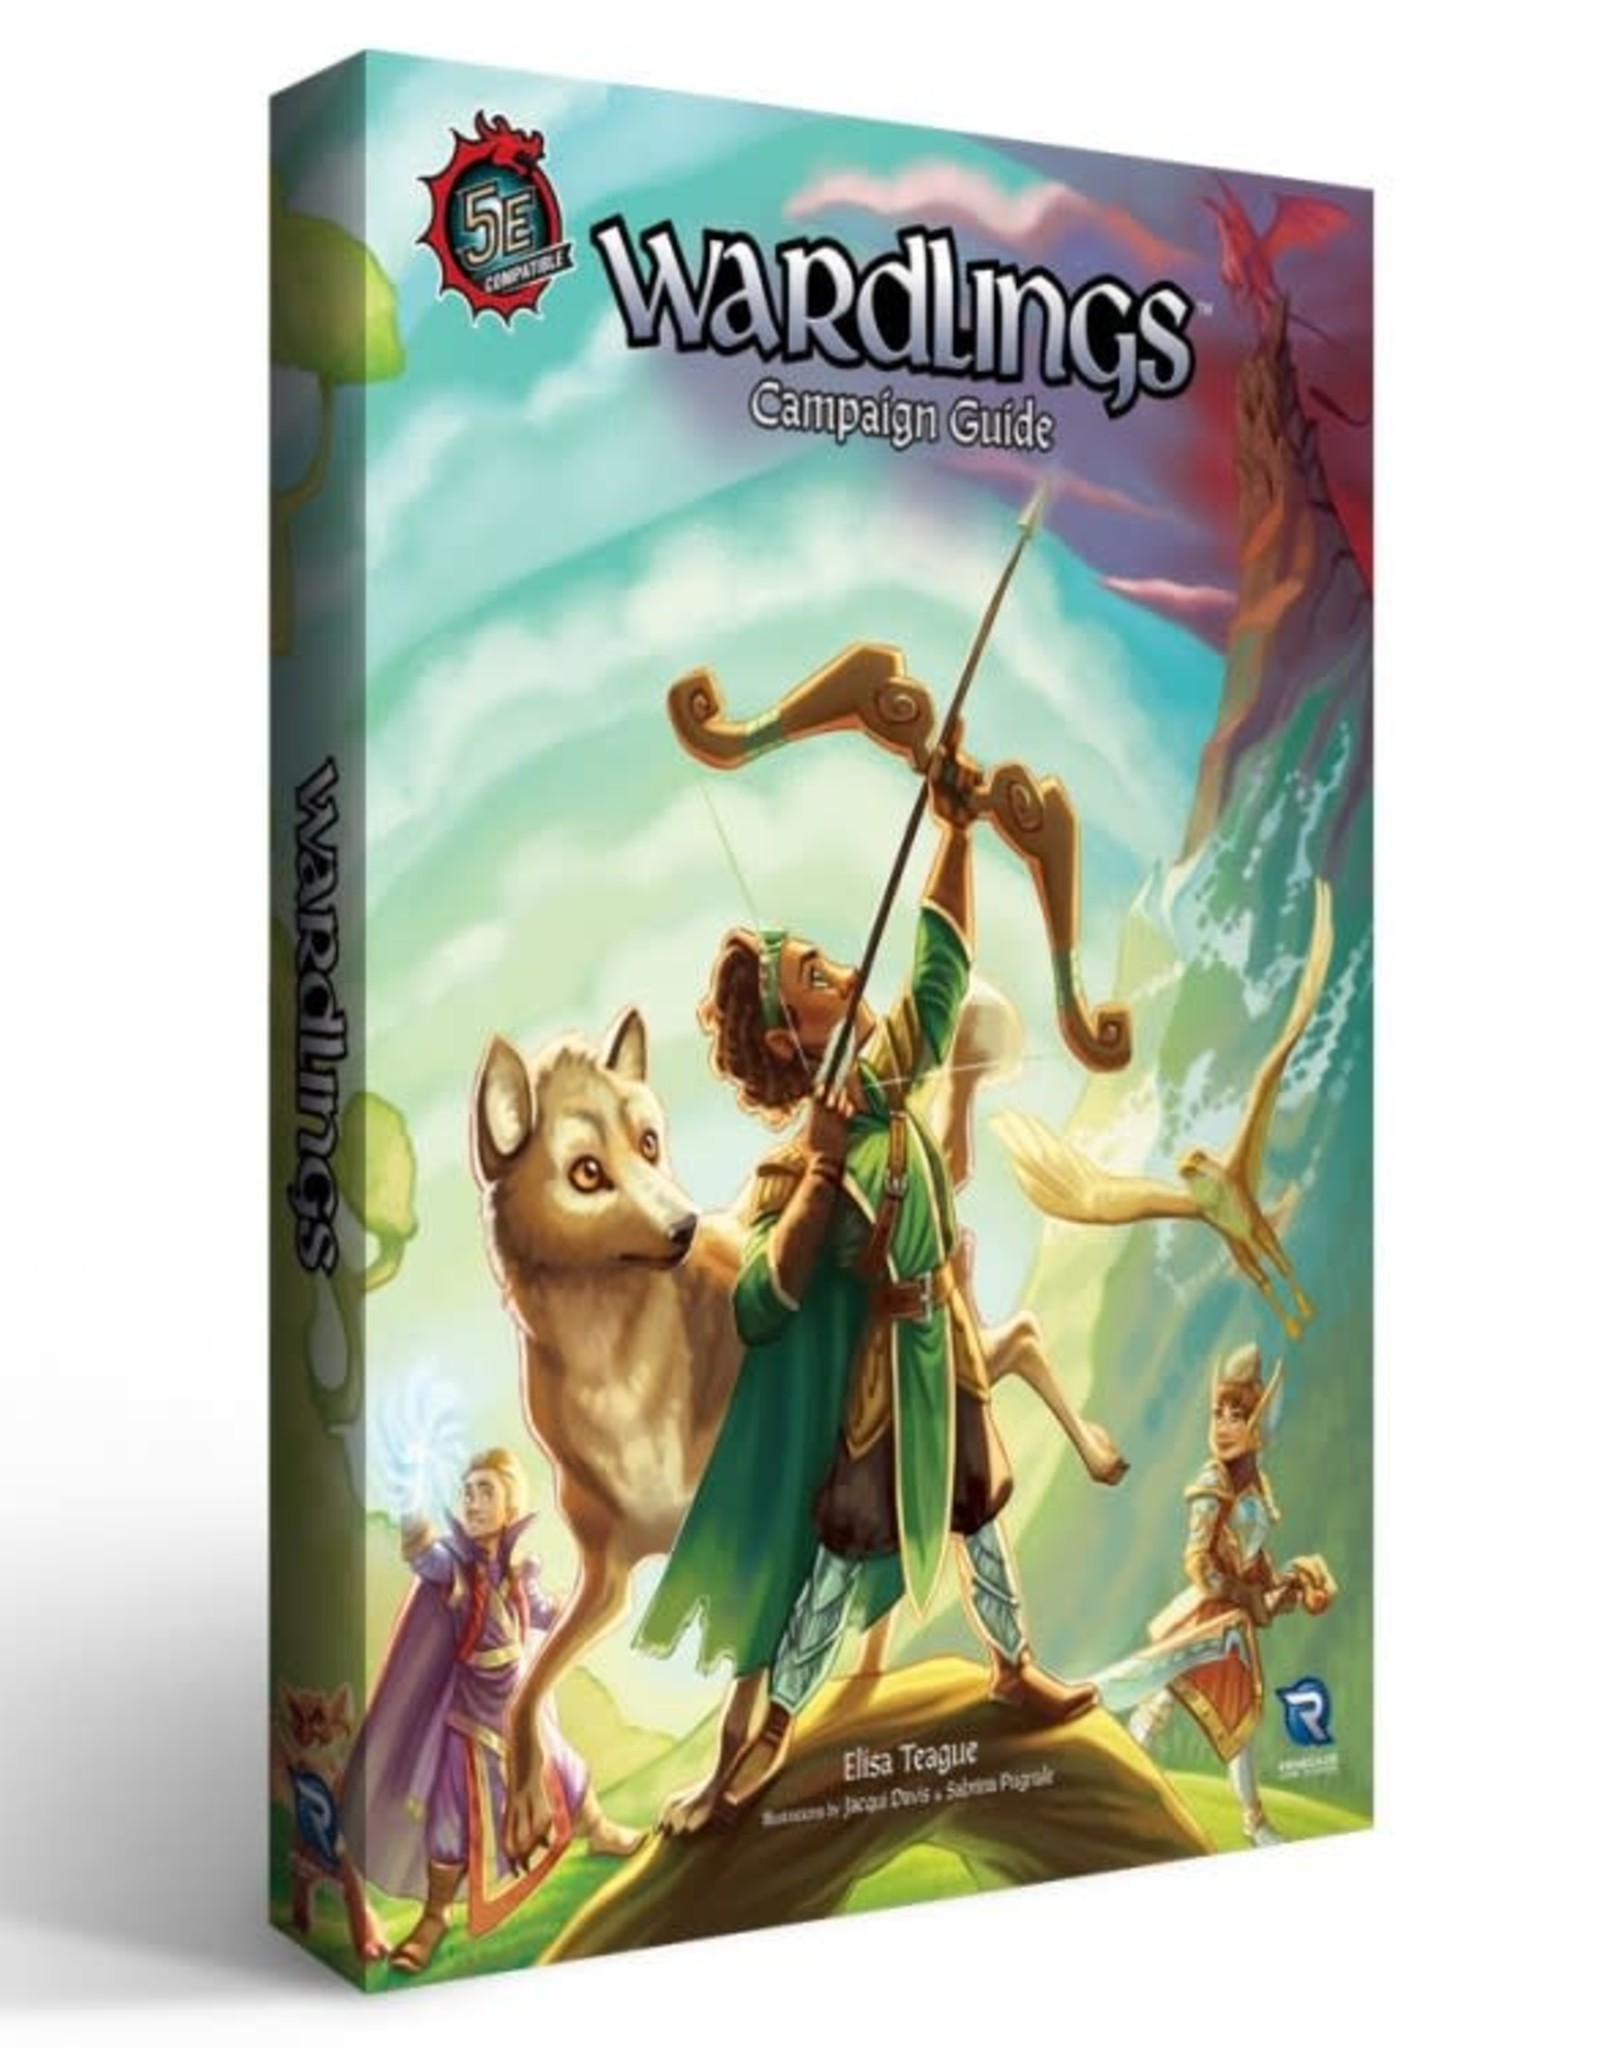 Renegade Game Studios Wardlings Campiagn Guide 5E Compatible